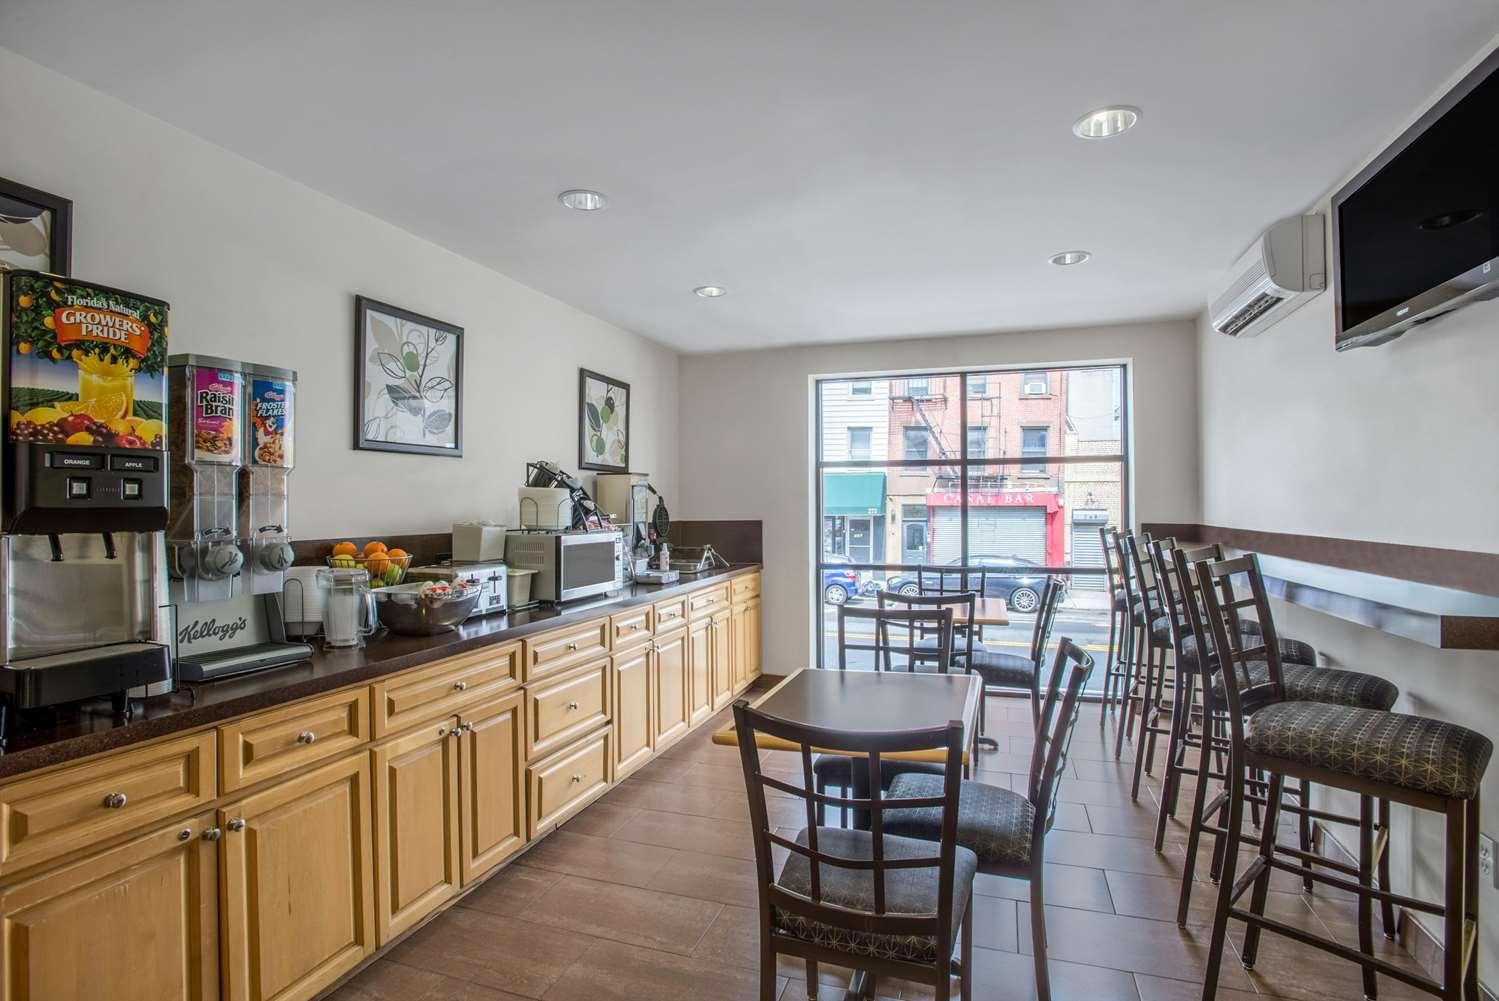 proam - Super 8 Hotel Brooklyn Heights